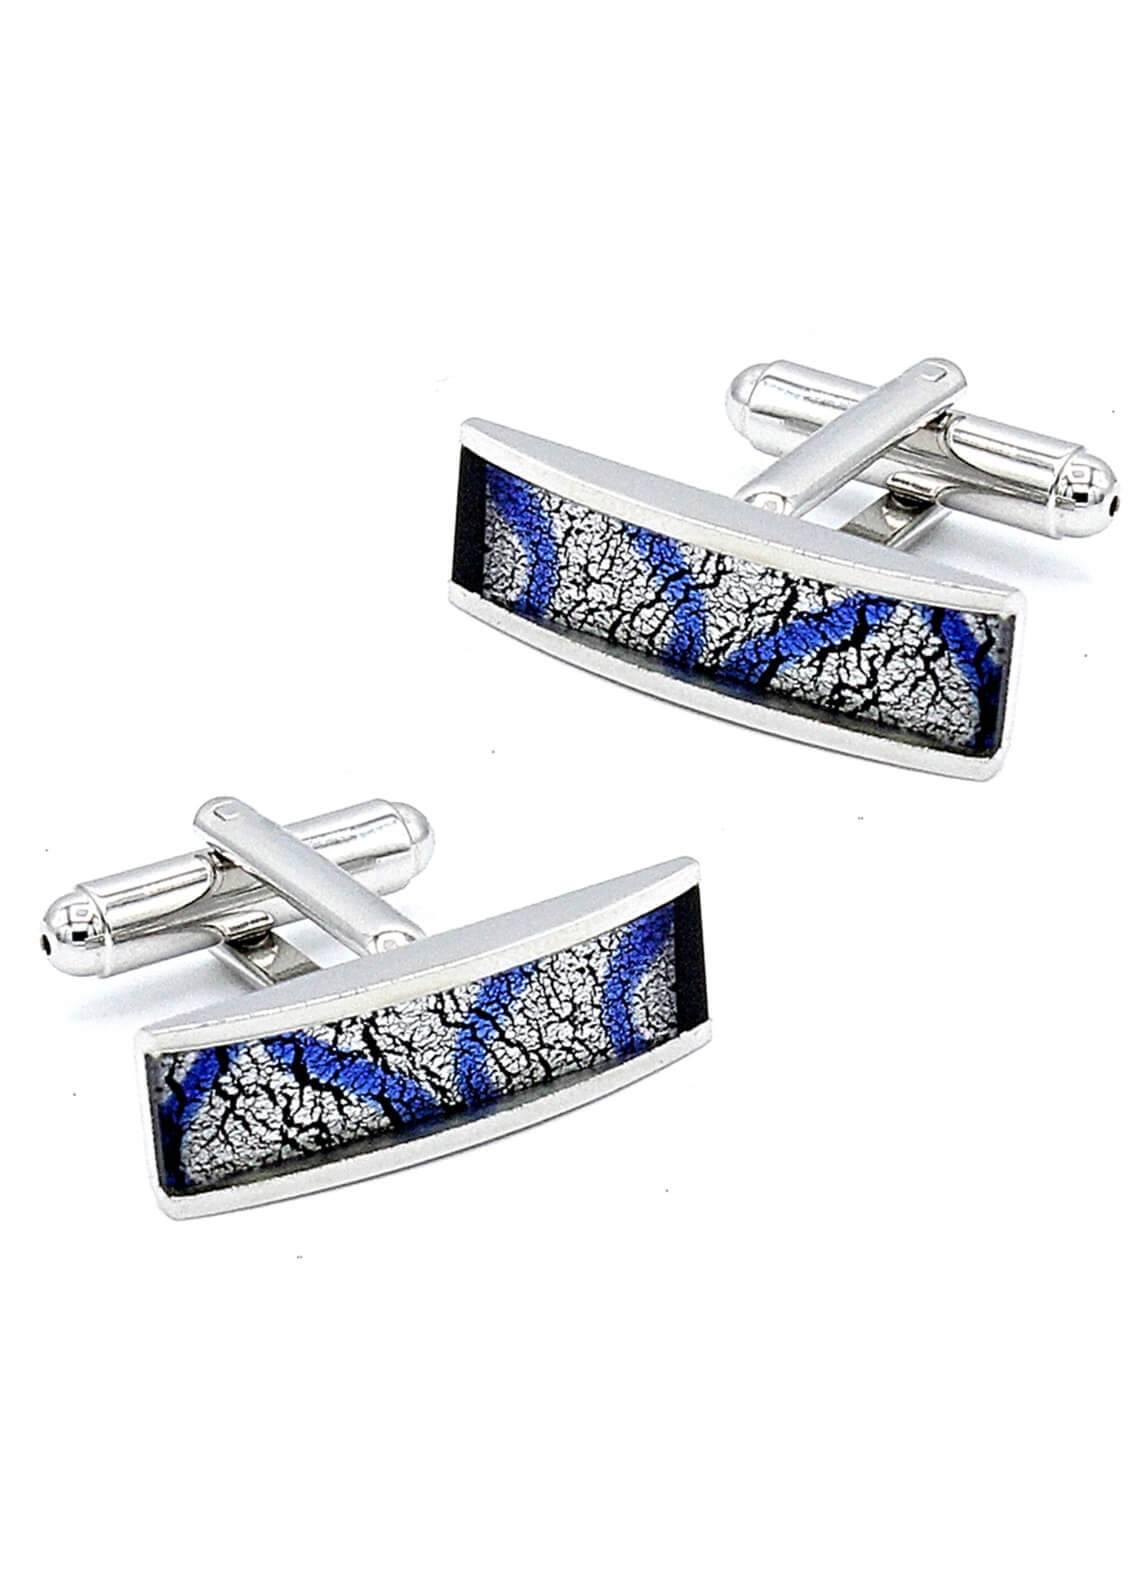 Skangen Stylish Metal  Cufflinks SCFF-X-009 -